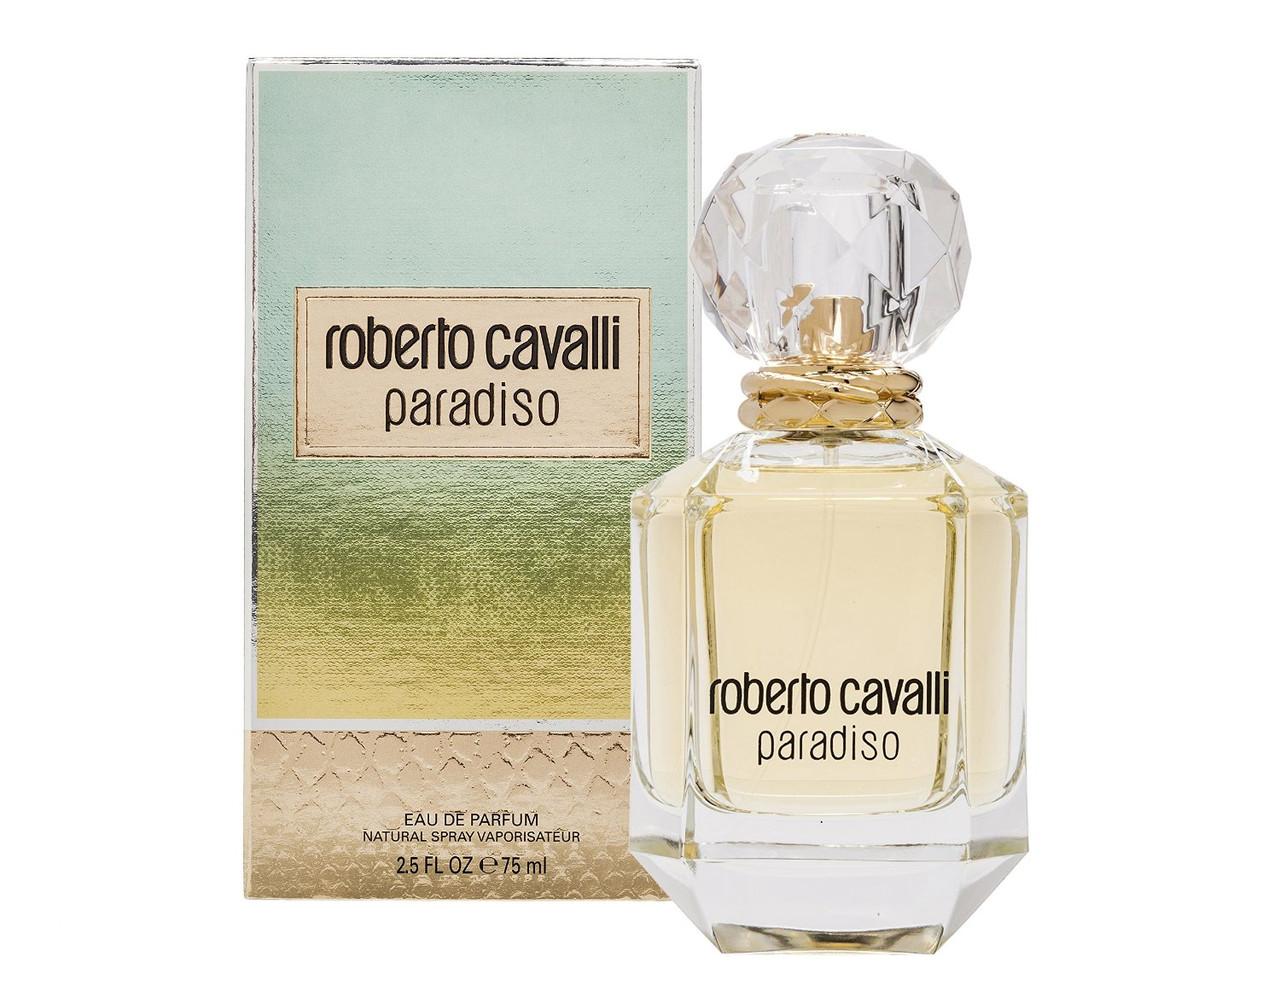 Наливная парфюмерия ТМ EVIS.  №89 (тип запаха  Paradiso)  Реплика